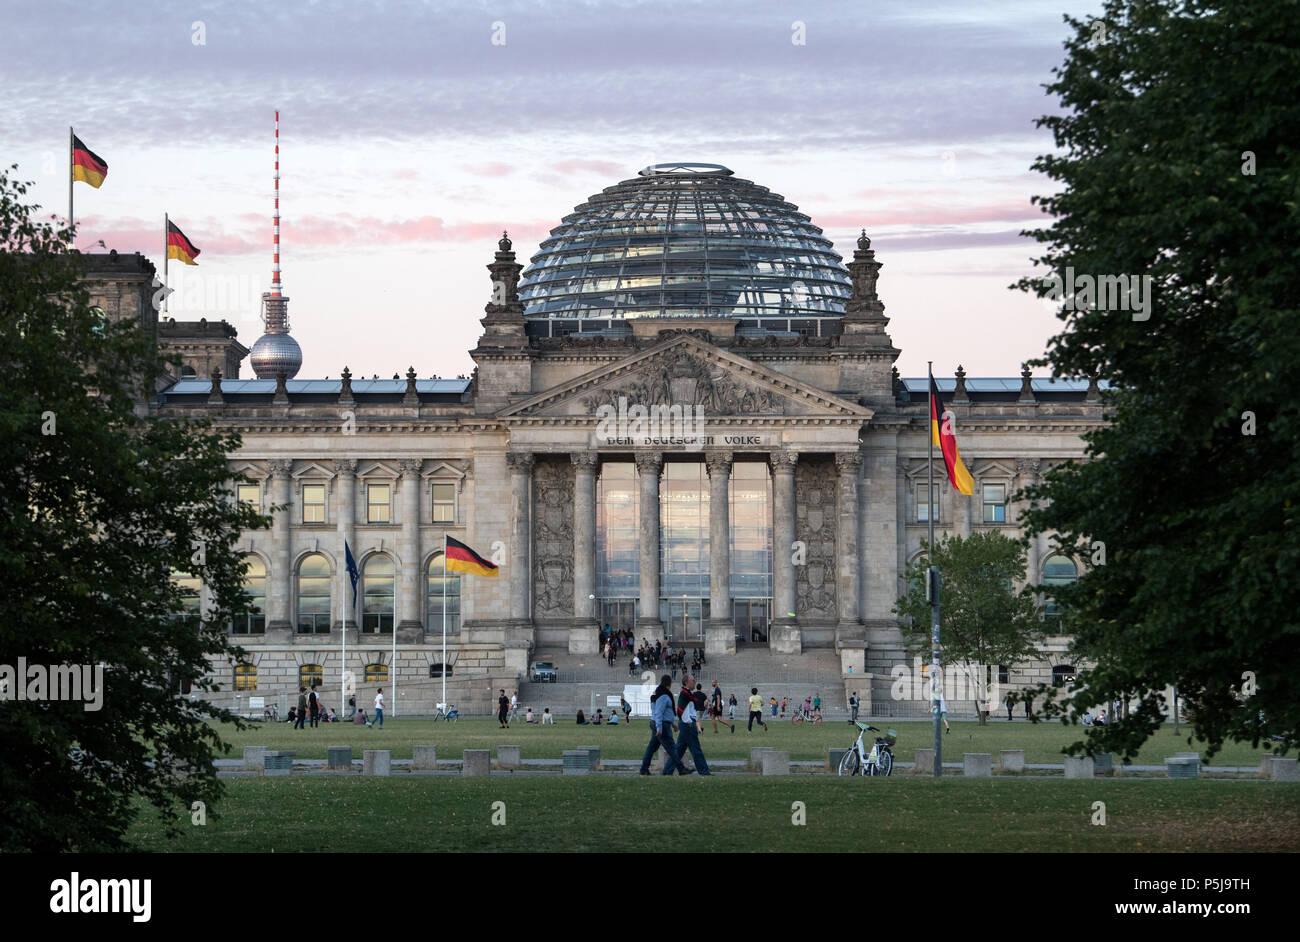 26 June 018, Germany, Berlin: Strollers walking past the German Bundestag. Photo: Bernd von Jutrczenka/dpa Stock Photo